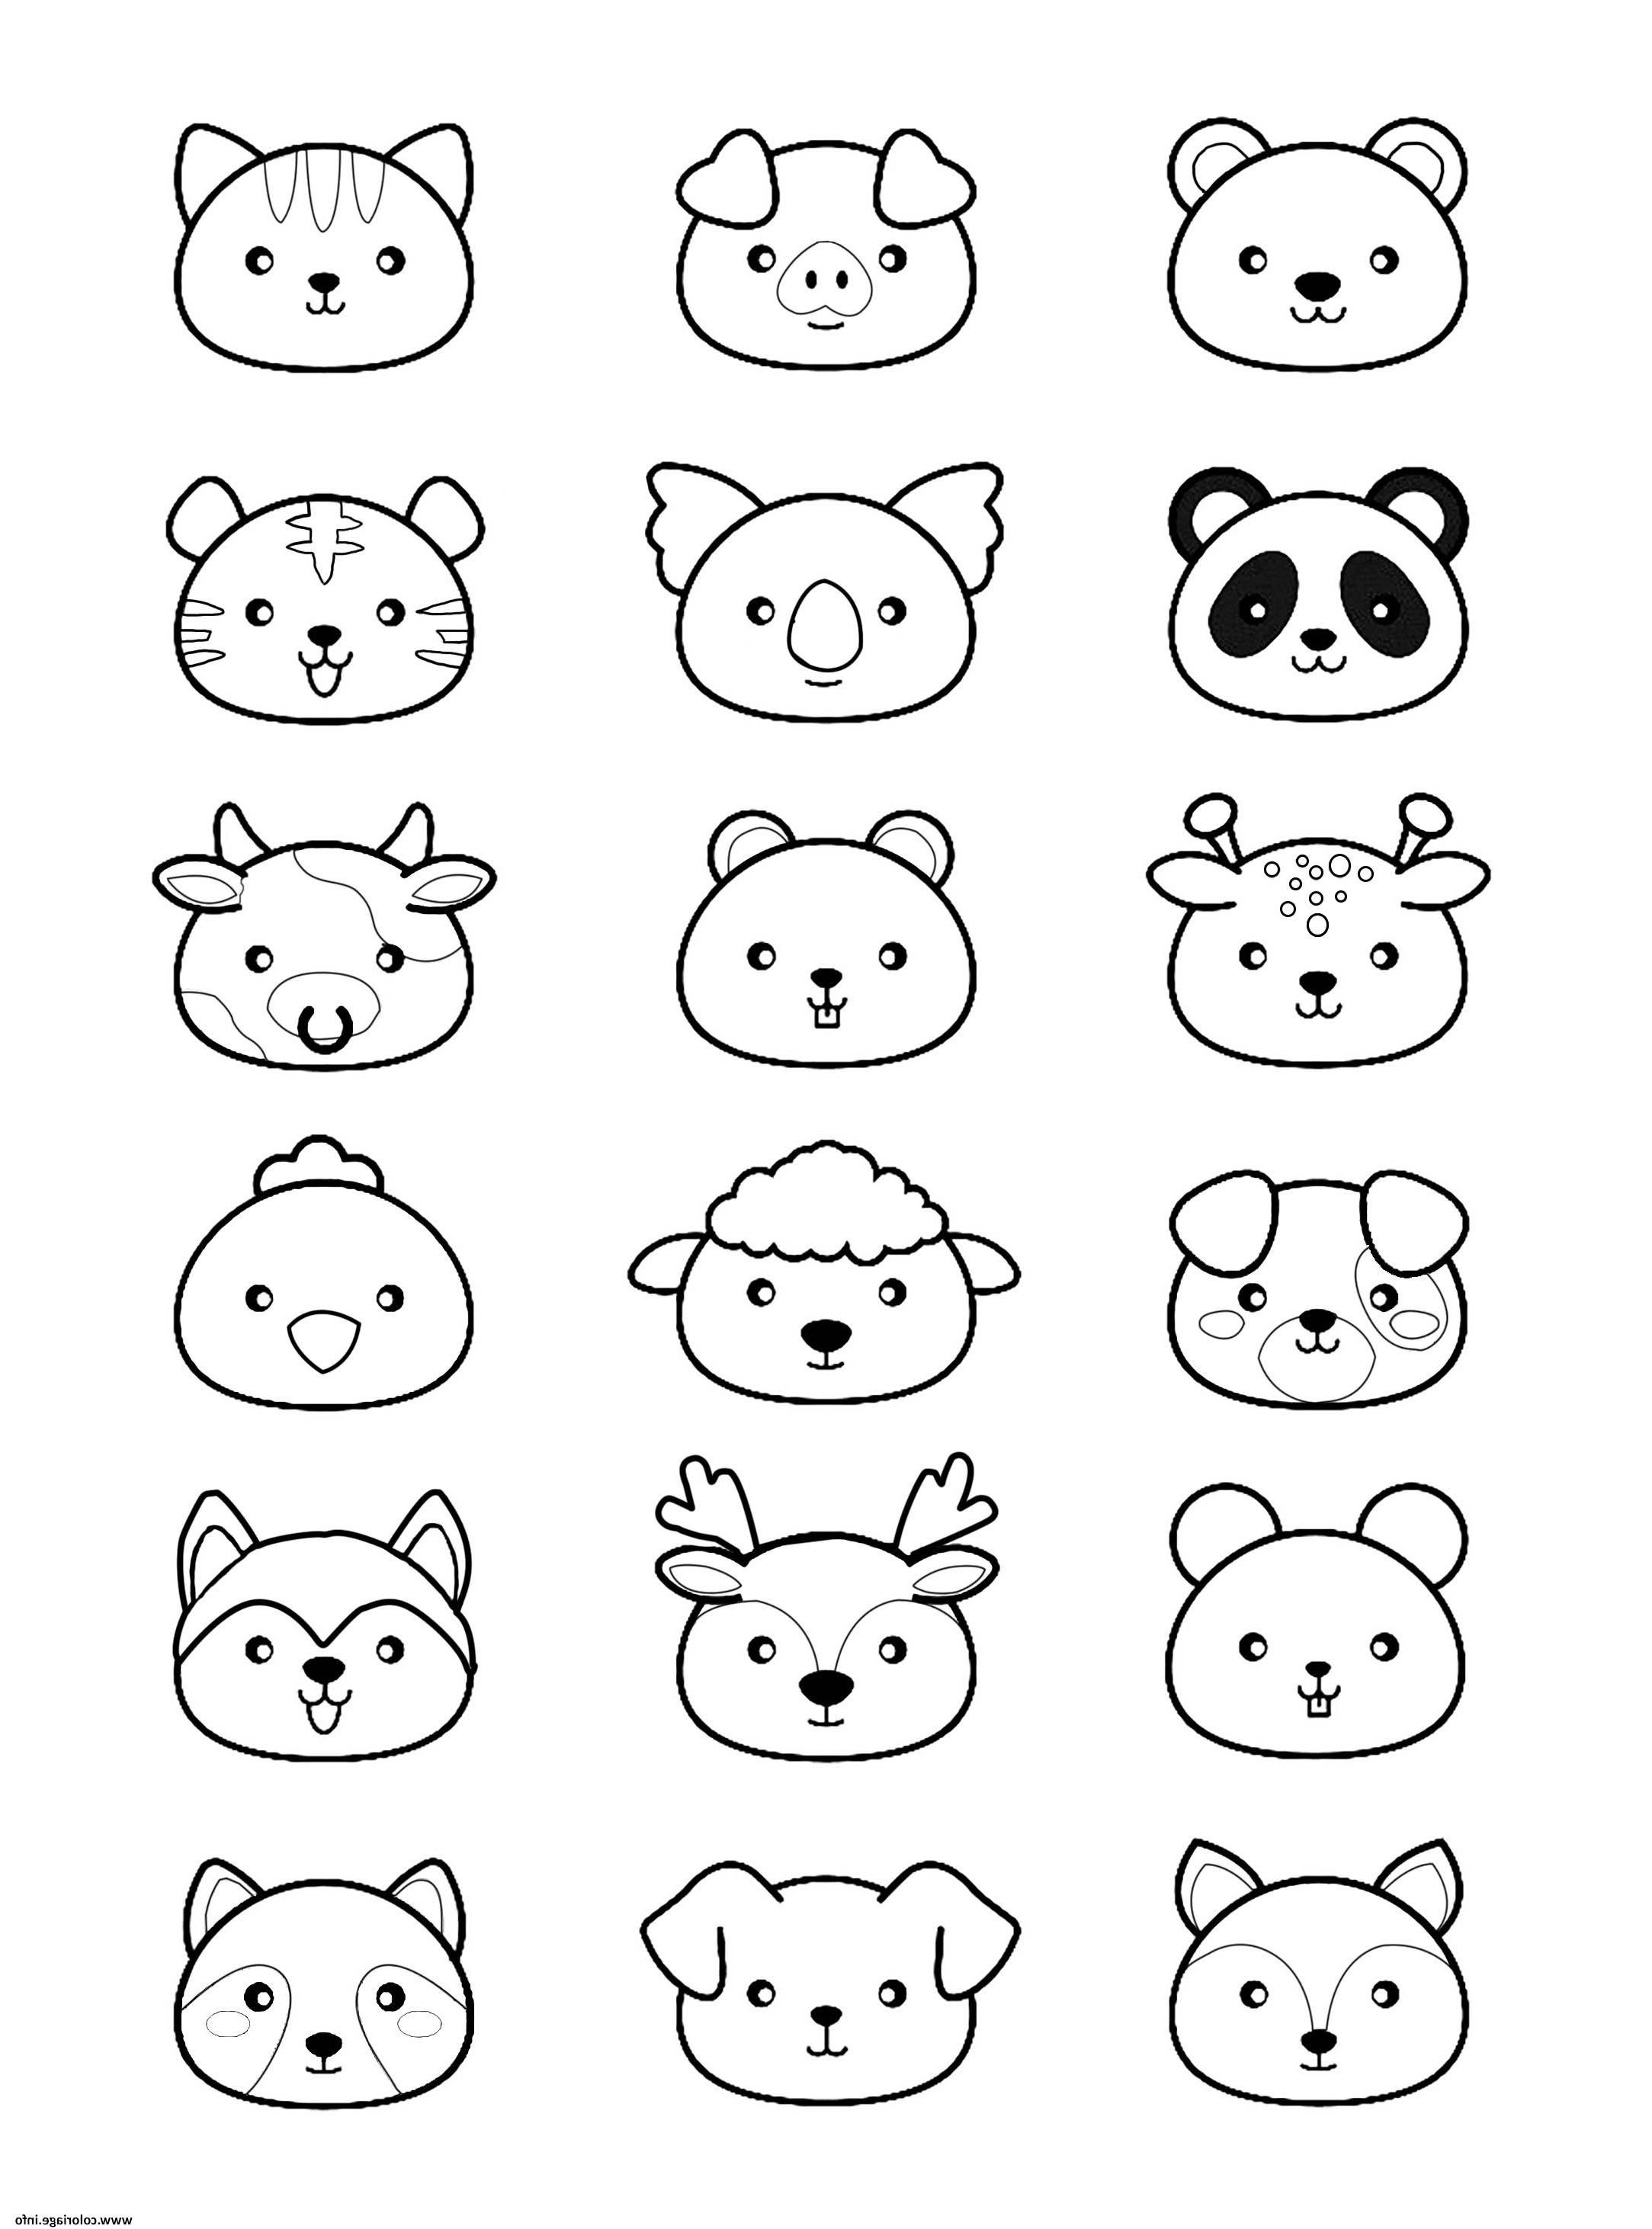 10 Elegant De Dessin Kawaii Sushi Collection Panda Coloring Pages Cute Kawaii Drawings Cute Coloring Pages